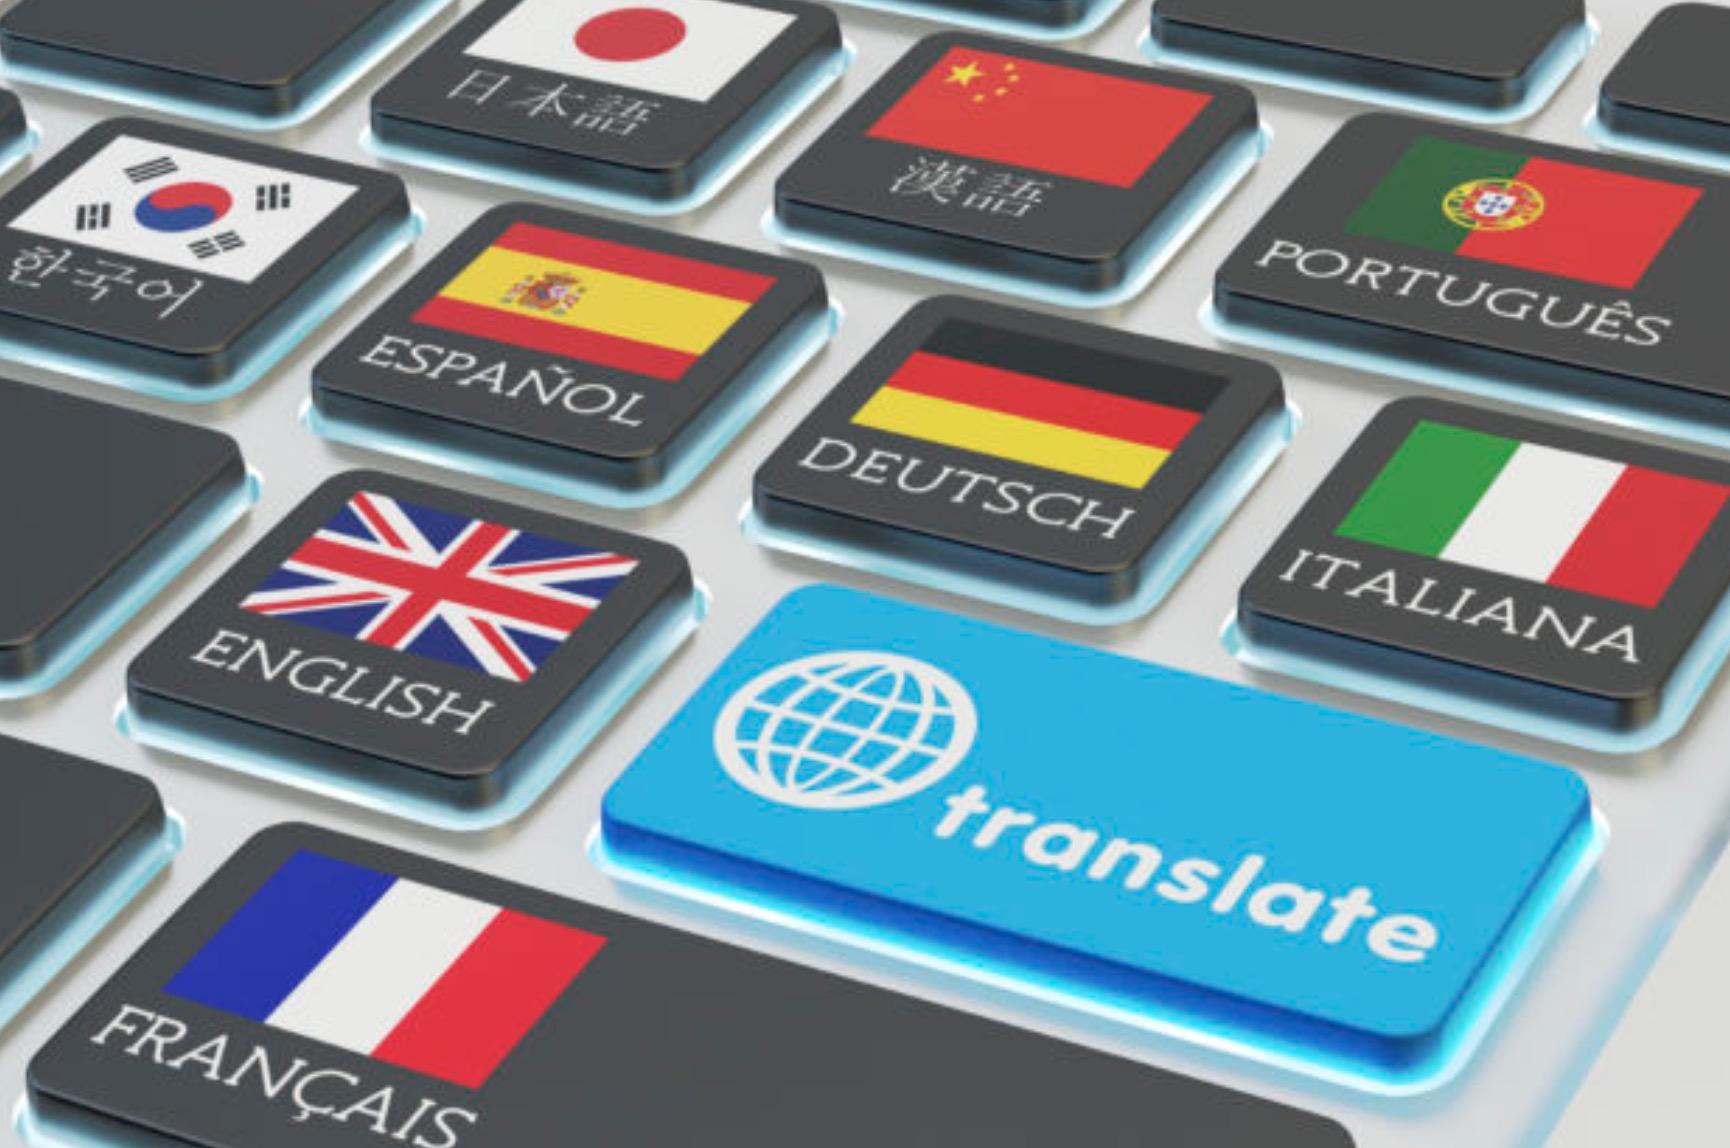 I migliori traduttori online più precisi e affidabili